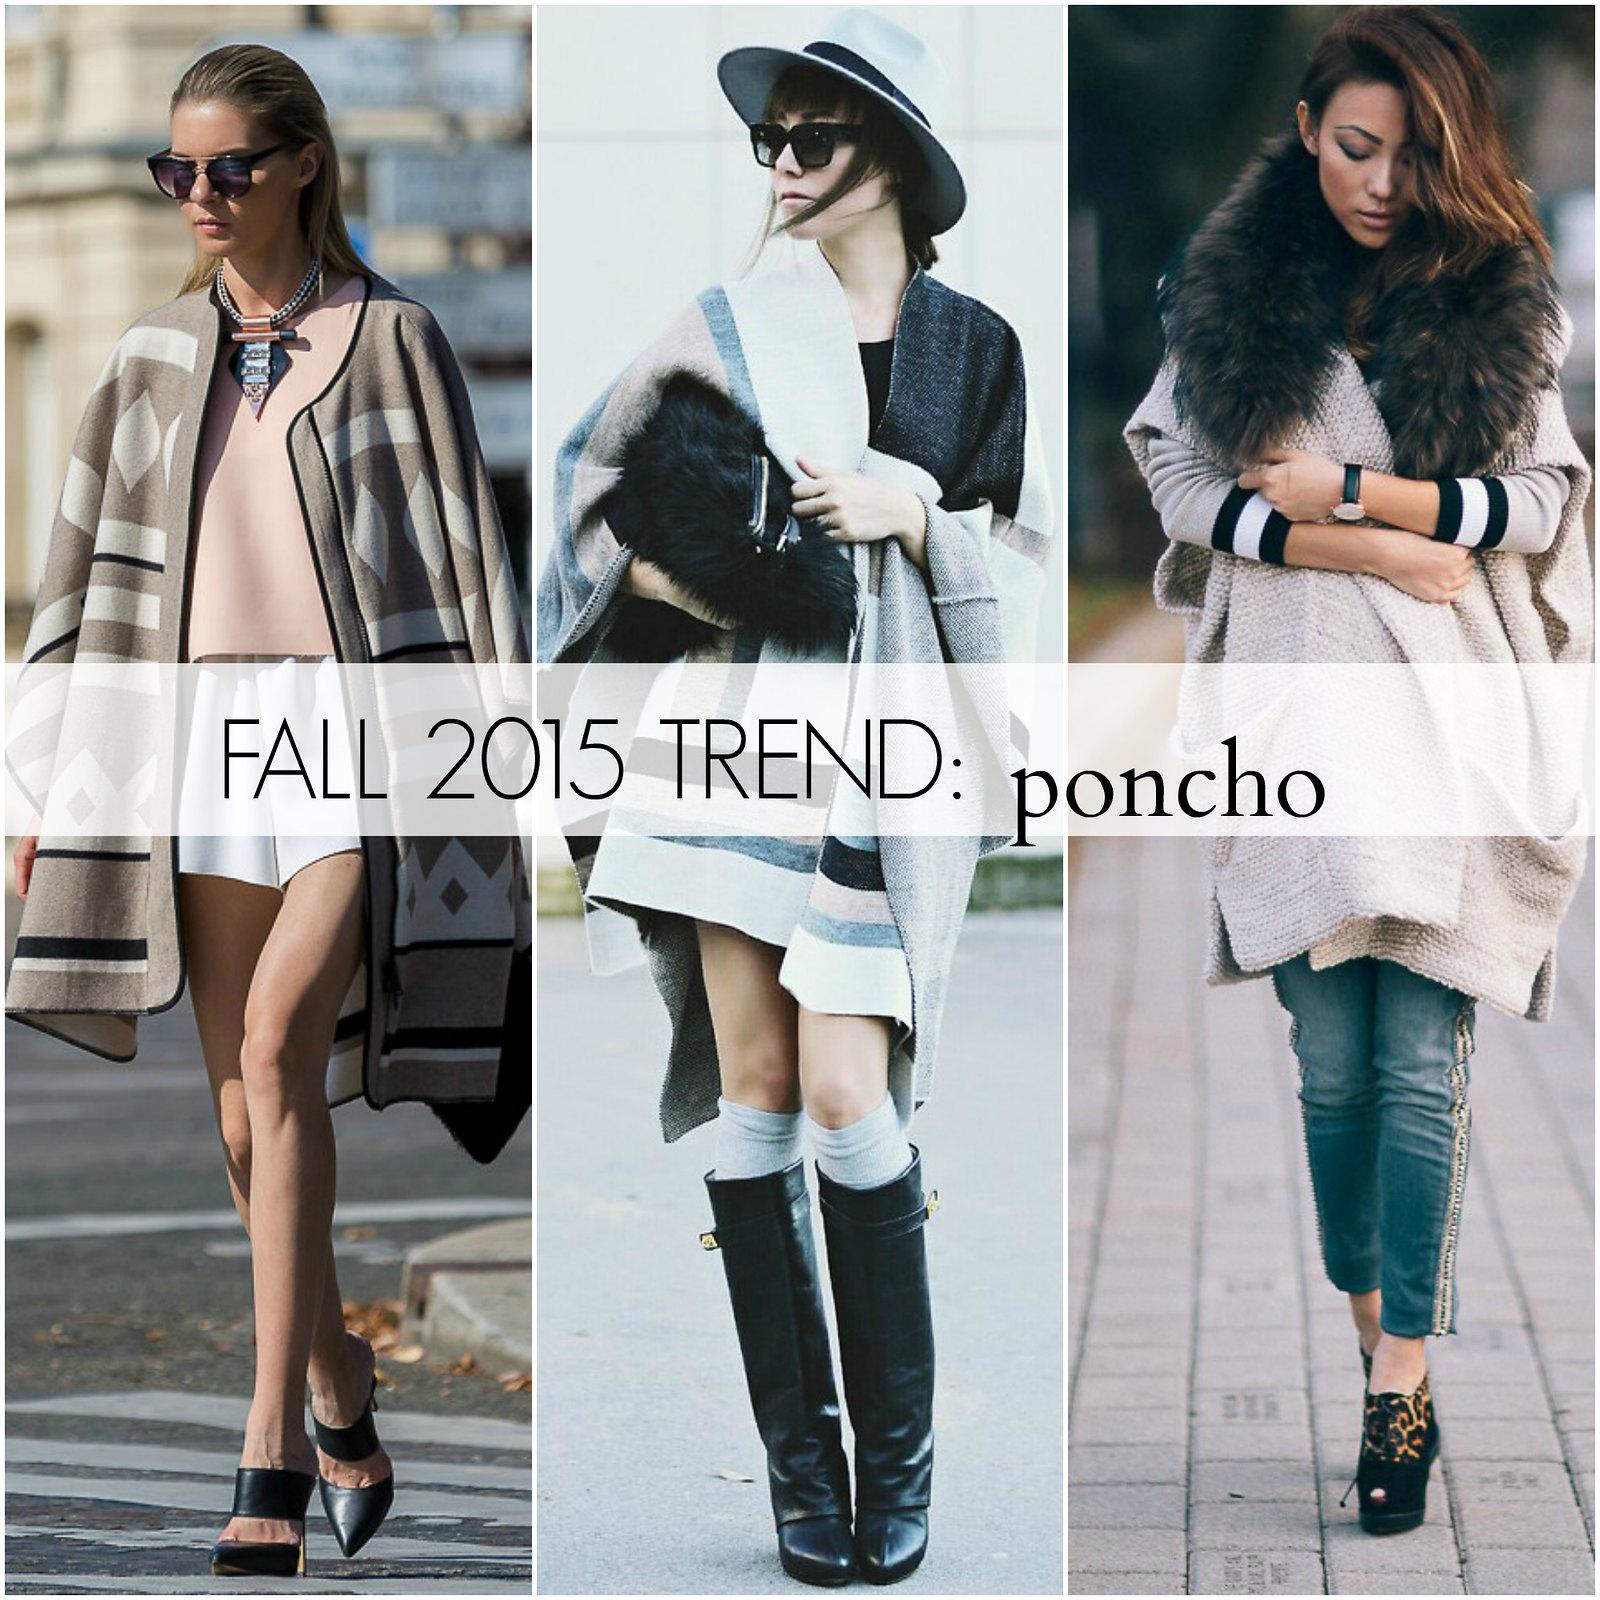 fall 2015 trend: PONCHO